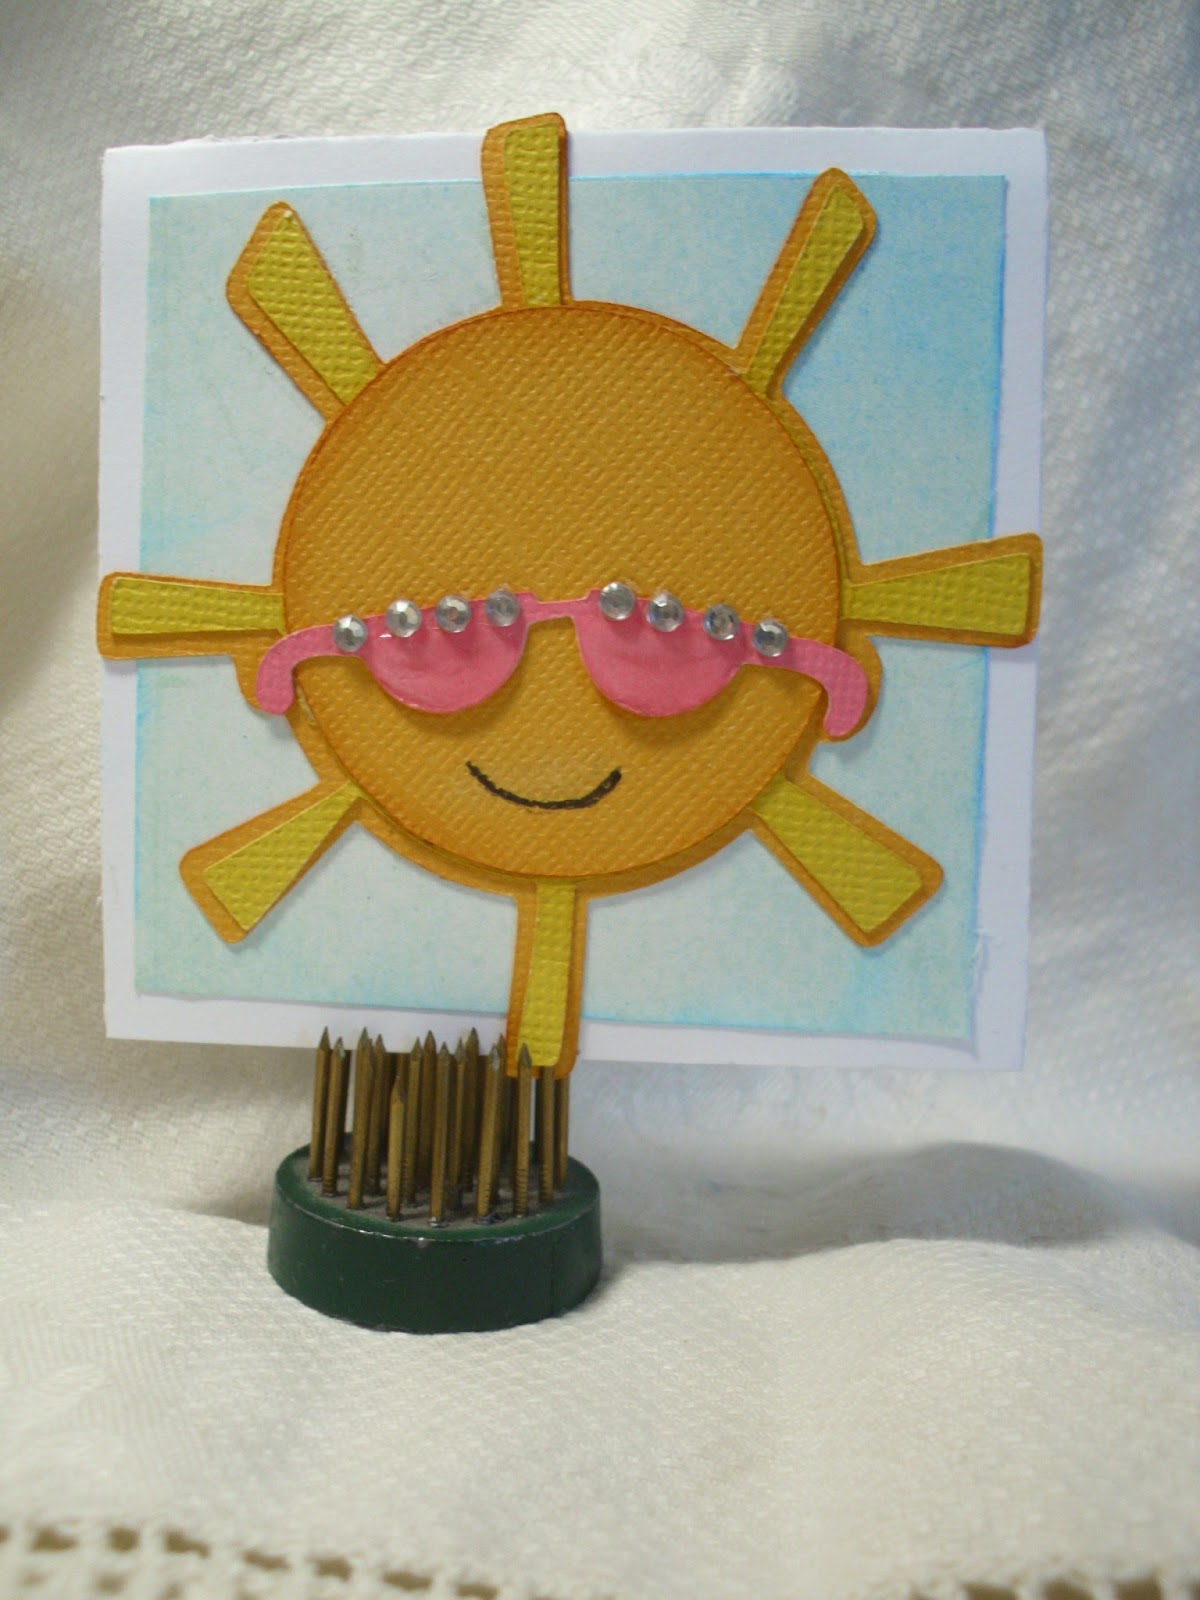 Shellys Craft Blog: Wearing Sunglasses In My Cricut Craft Room